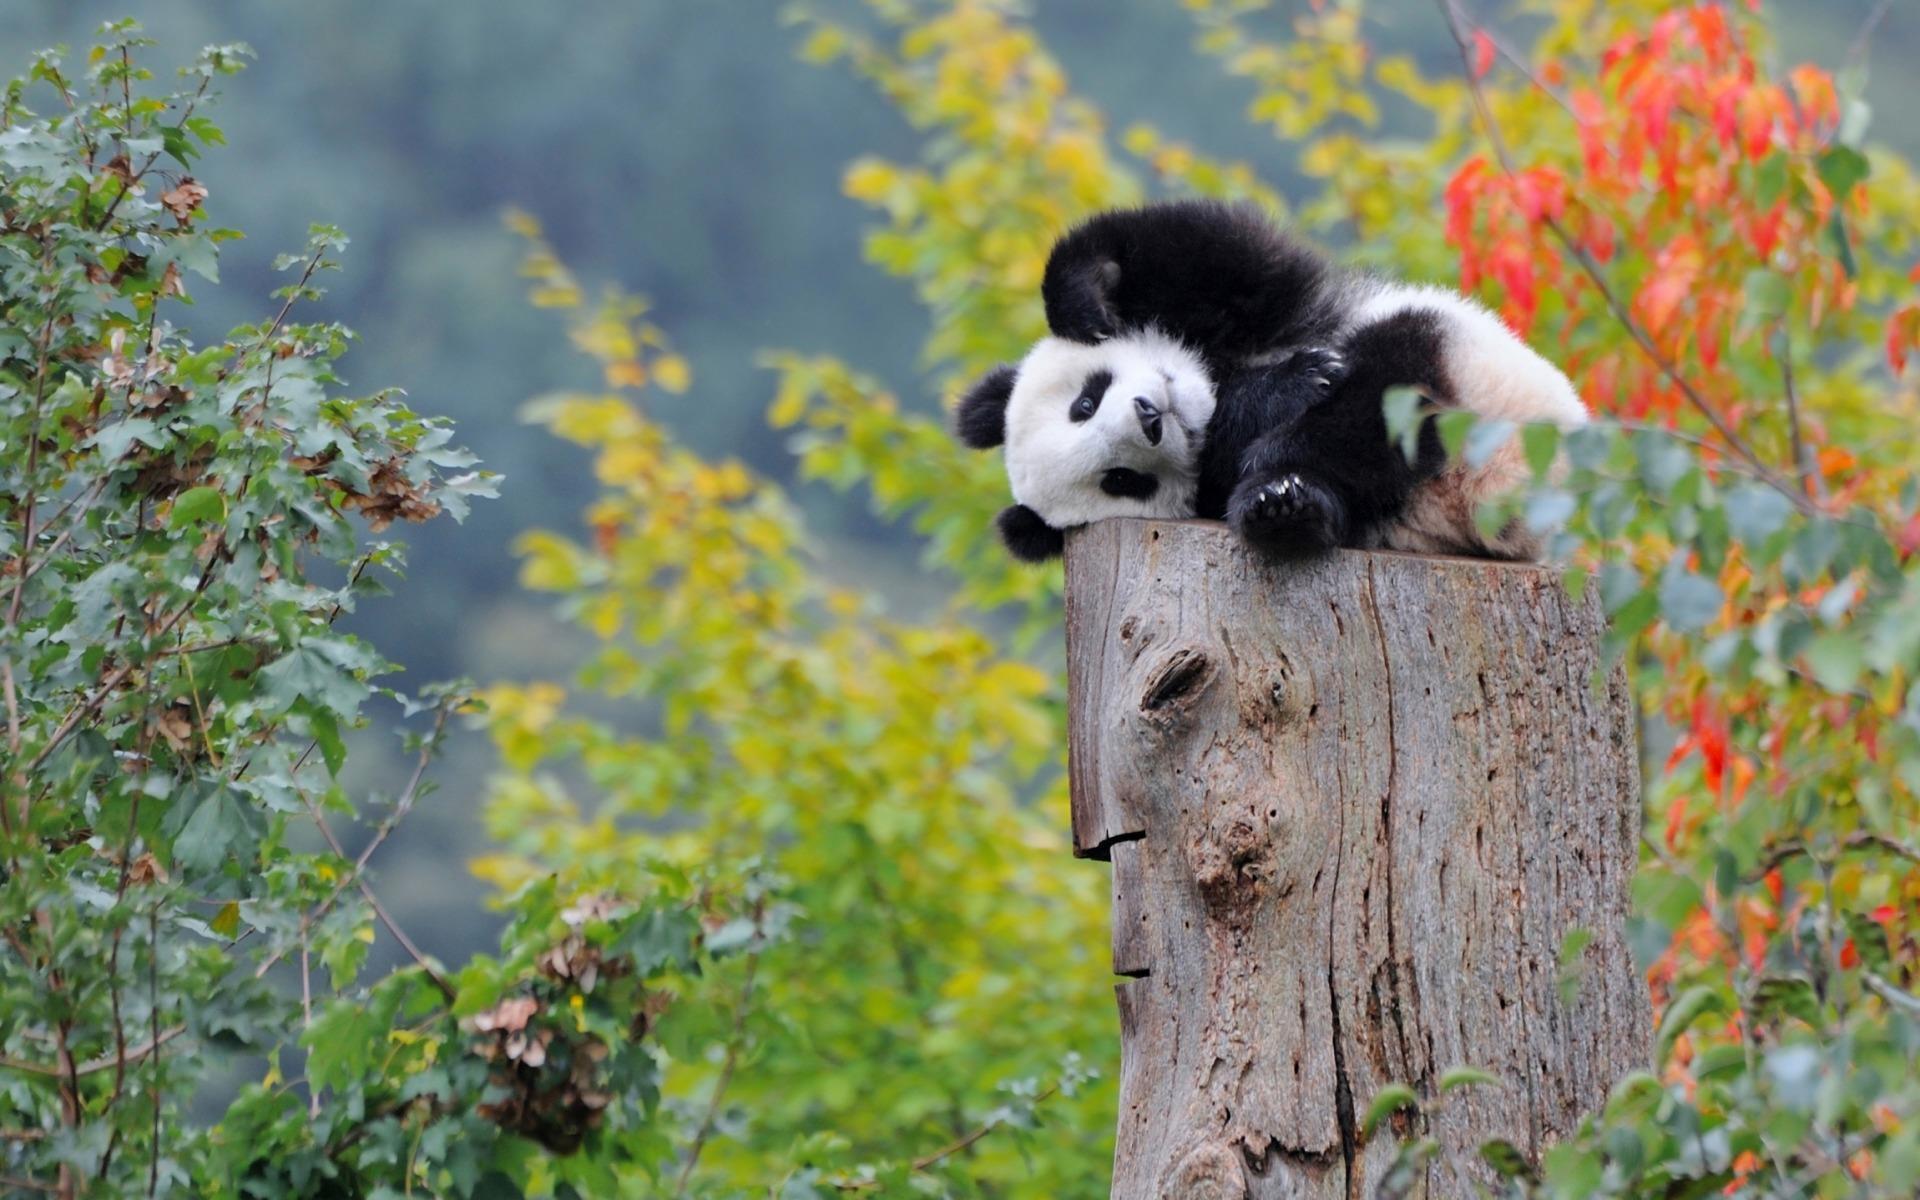 panda-windows-fonds-d-ecran_2